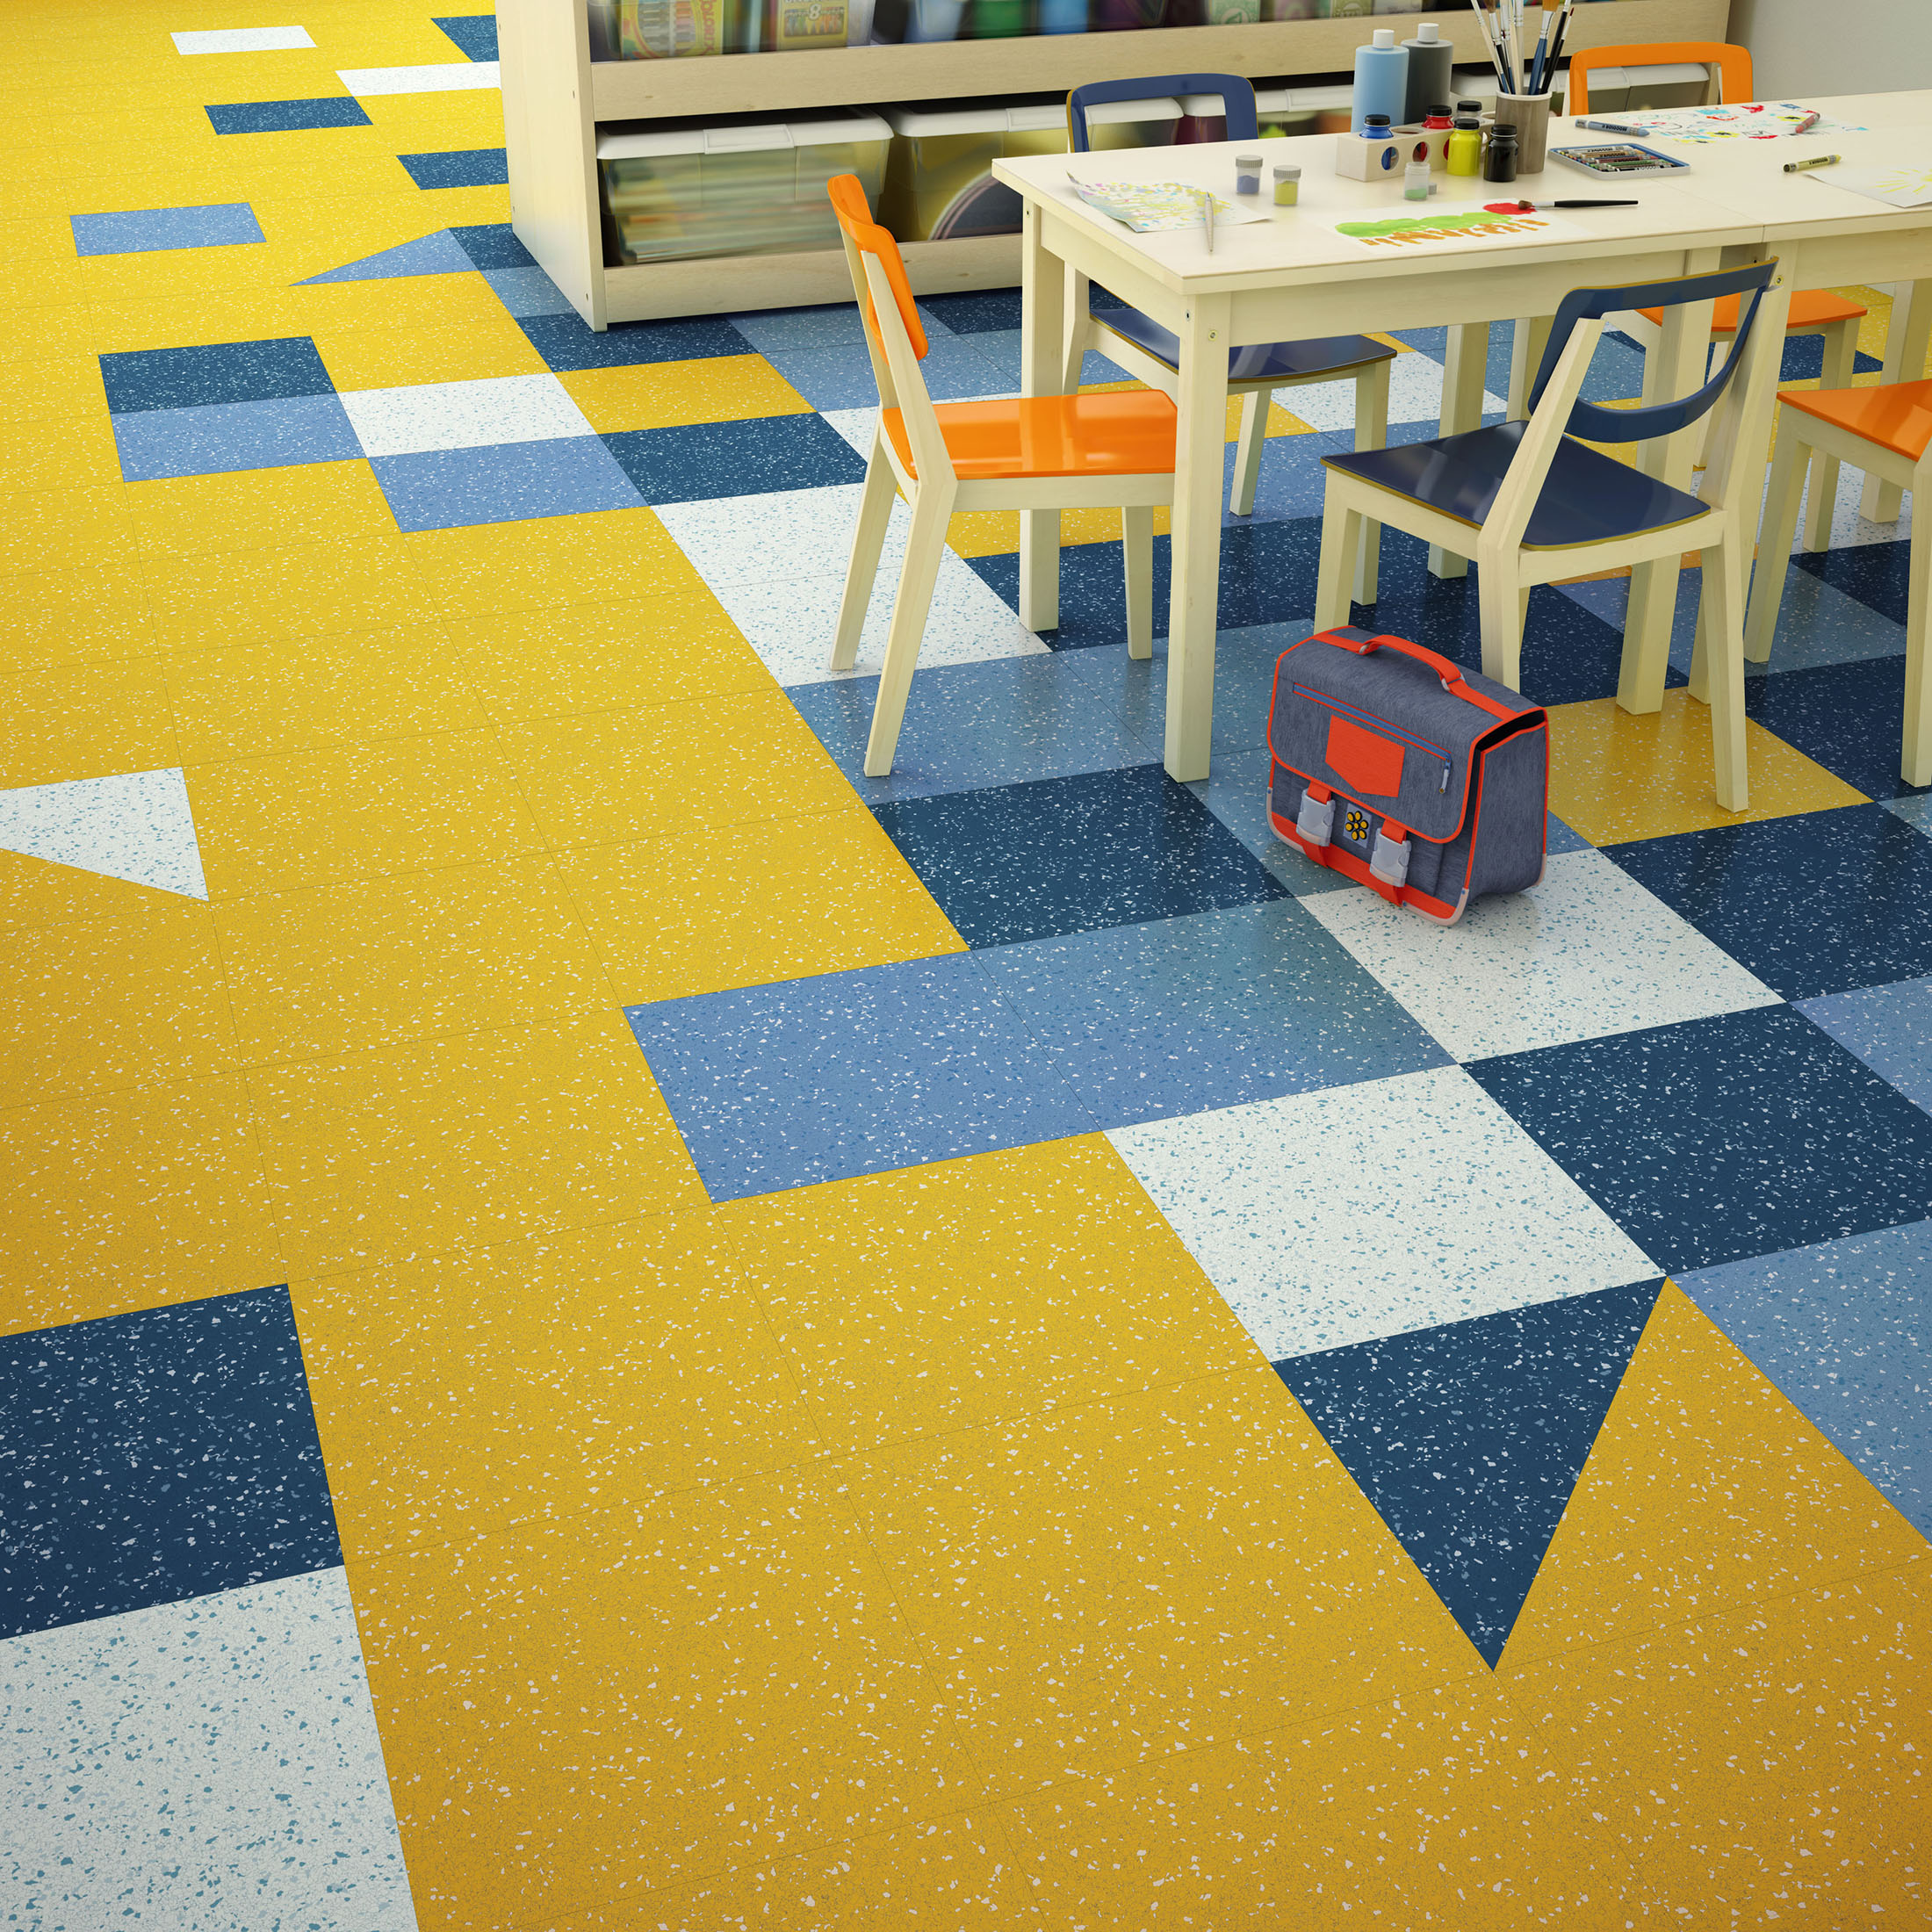 Hardwood Flooring Distributors Texas: Texas Granite® - Solid Vinyl Tile